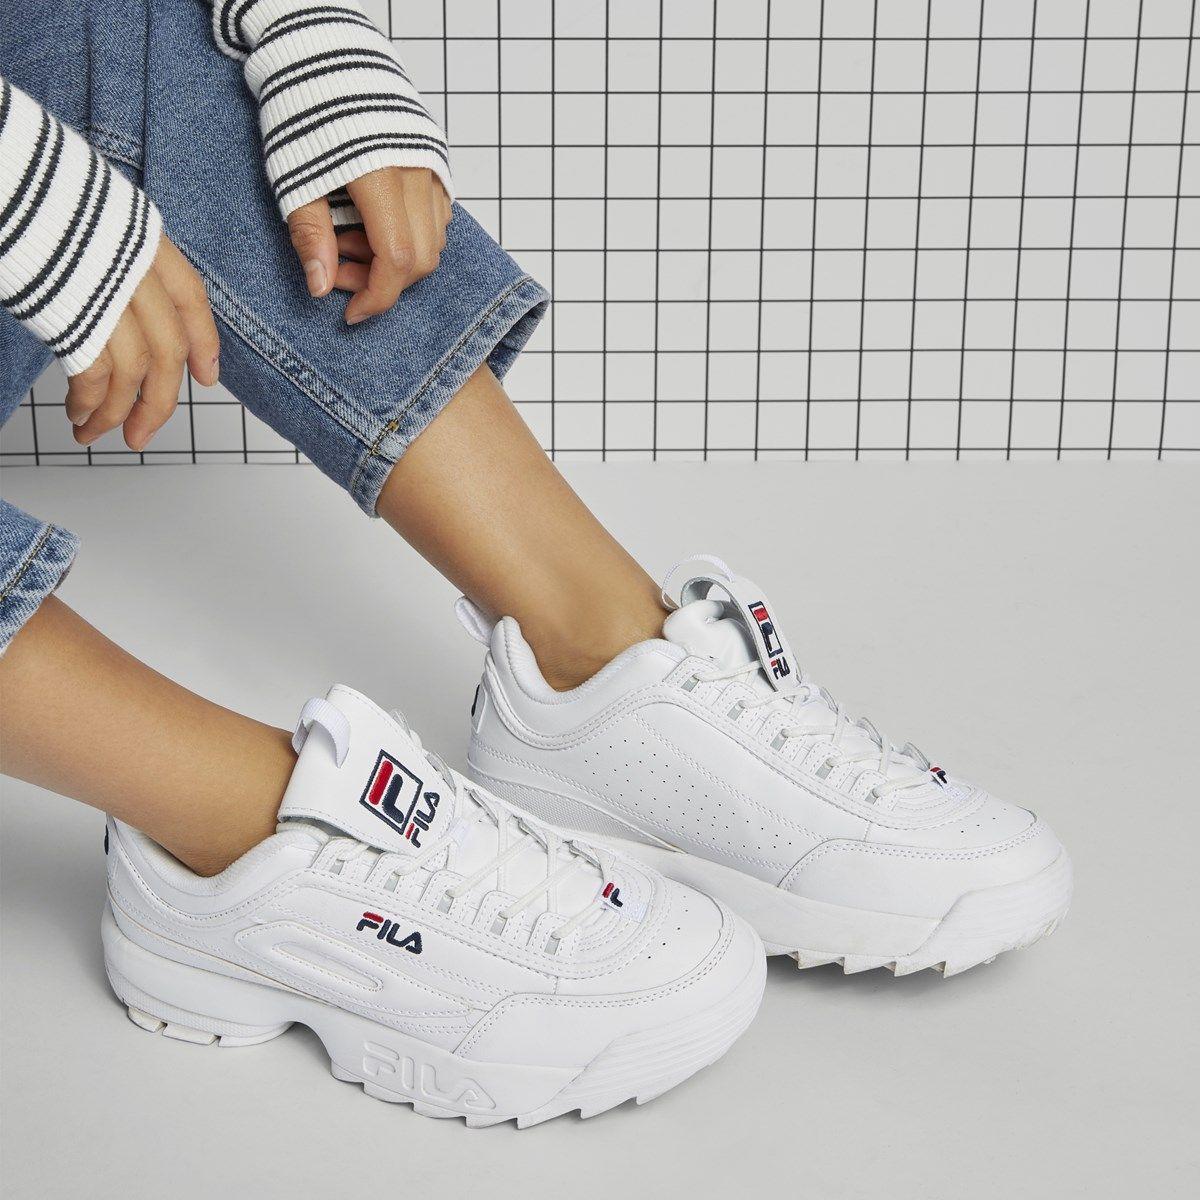 8d17f846 Women's Disruptor II Premium Sneakers in White in 2019 | TRENDS IN ...